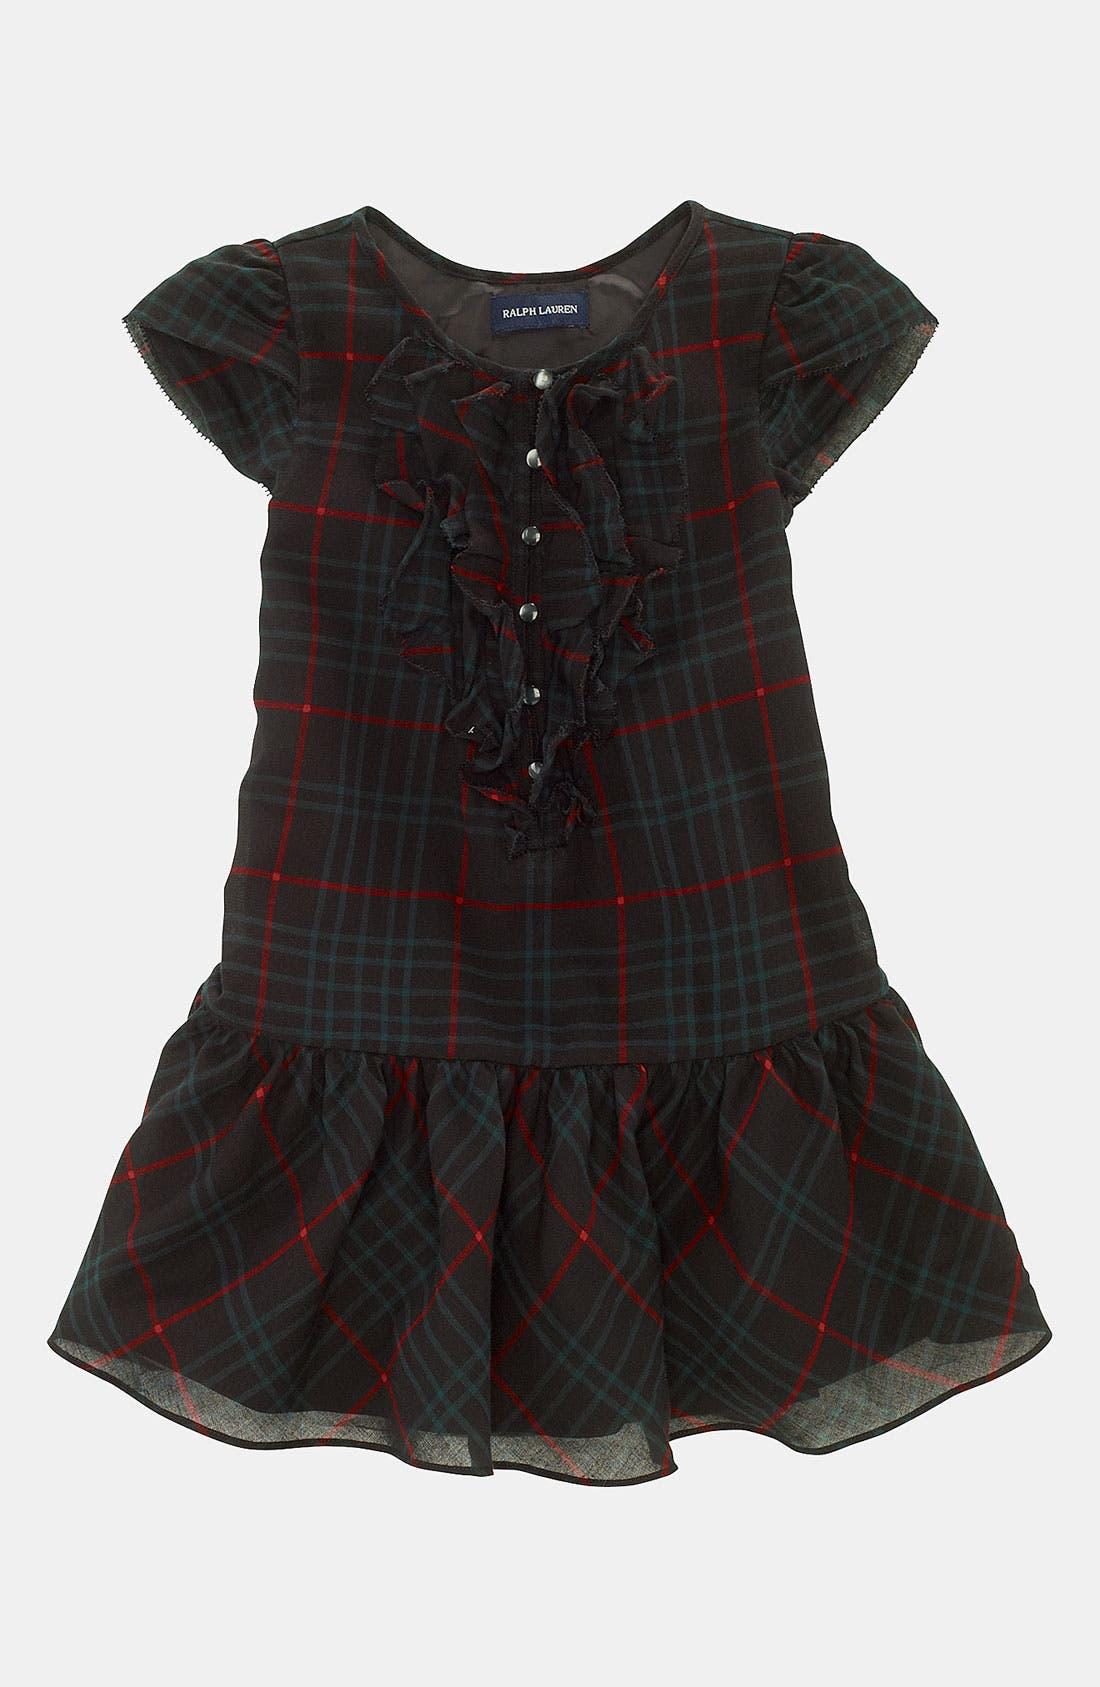 Alternate Image 1 Selected - Ralph Lauren Plaid Dress (Toddler)